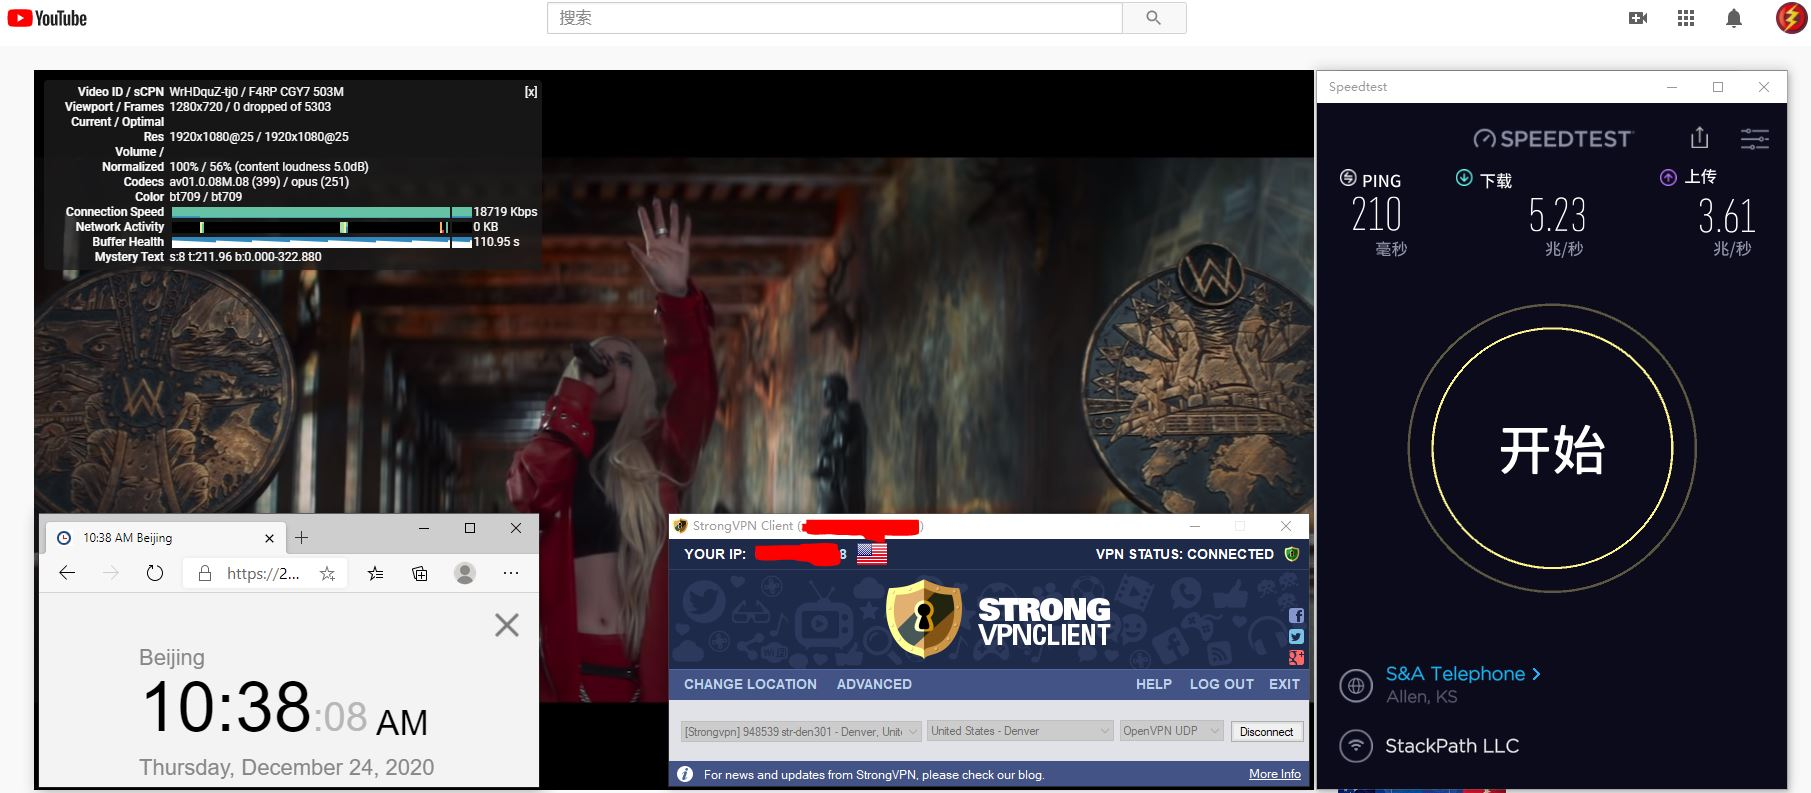 Windows10 StrongVPN USA - Denver 服务器 中国VPN 翻墙 科学上网 测试 - 20201224